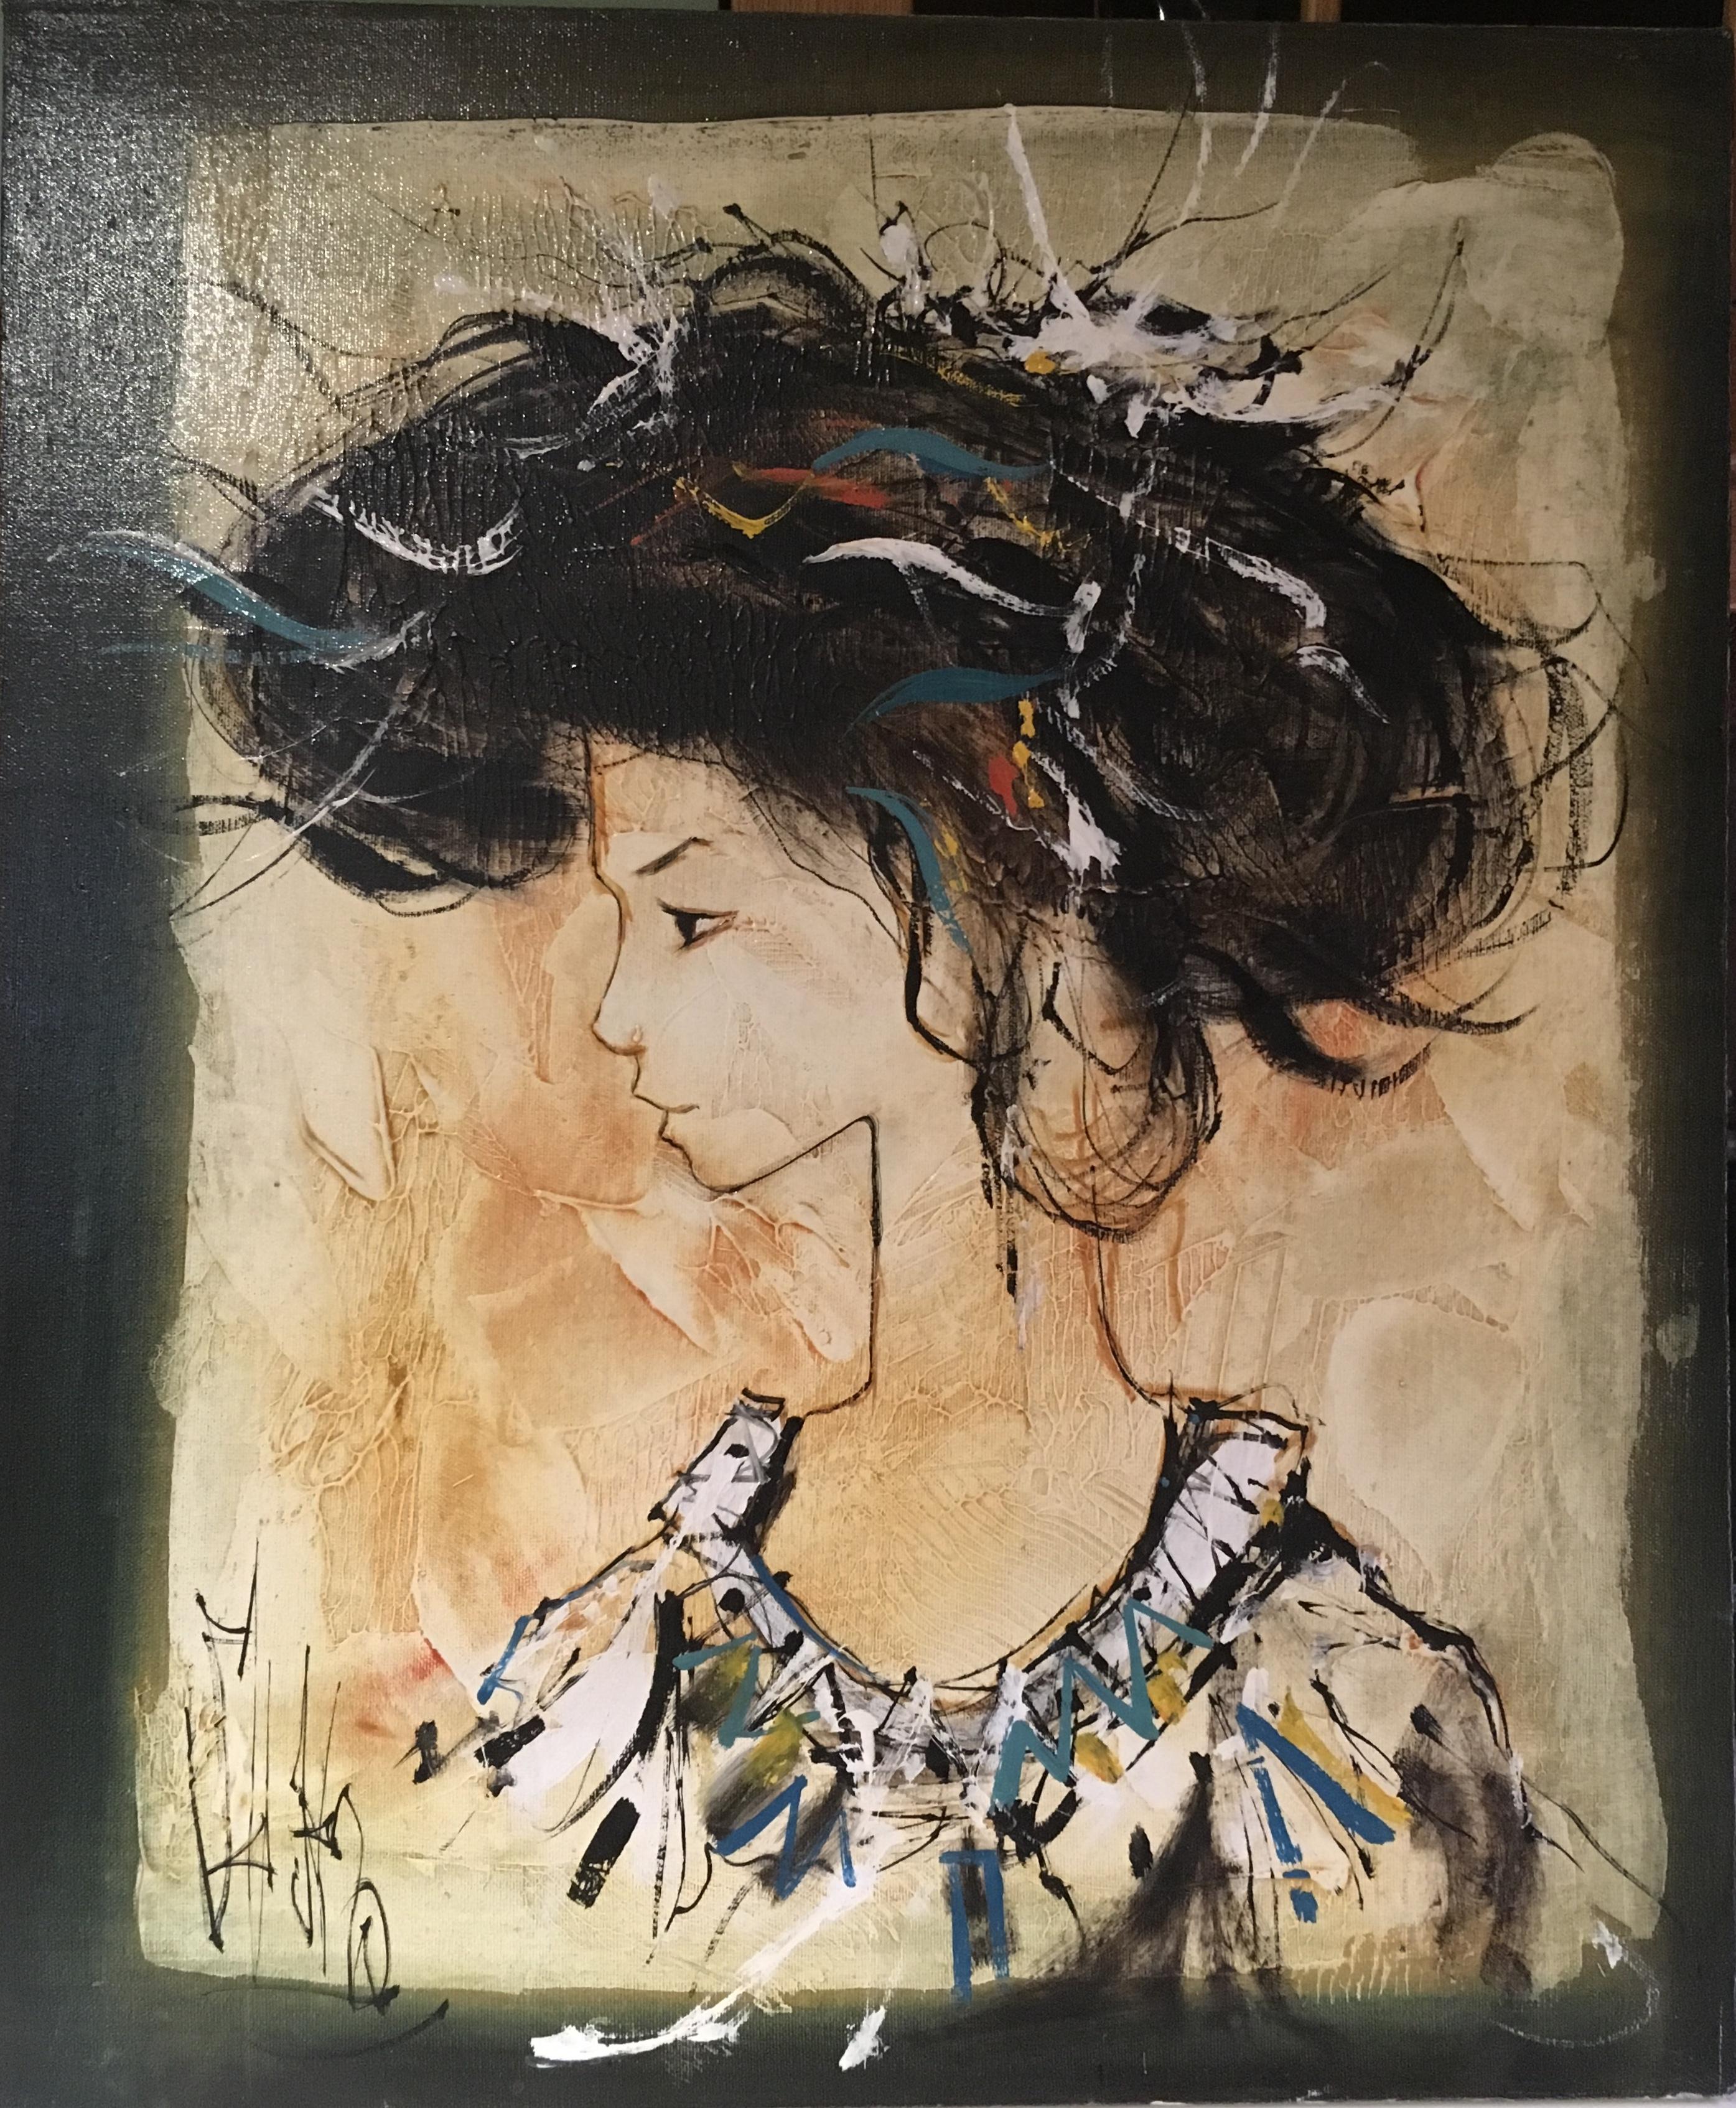 Mademoiselle artwork by Jean Baptiste Valadie - art listed for sale on Artplode